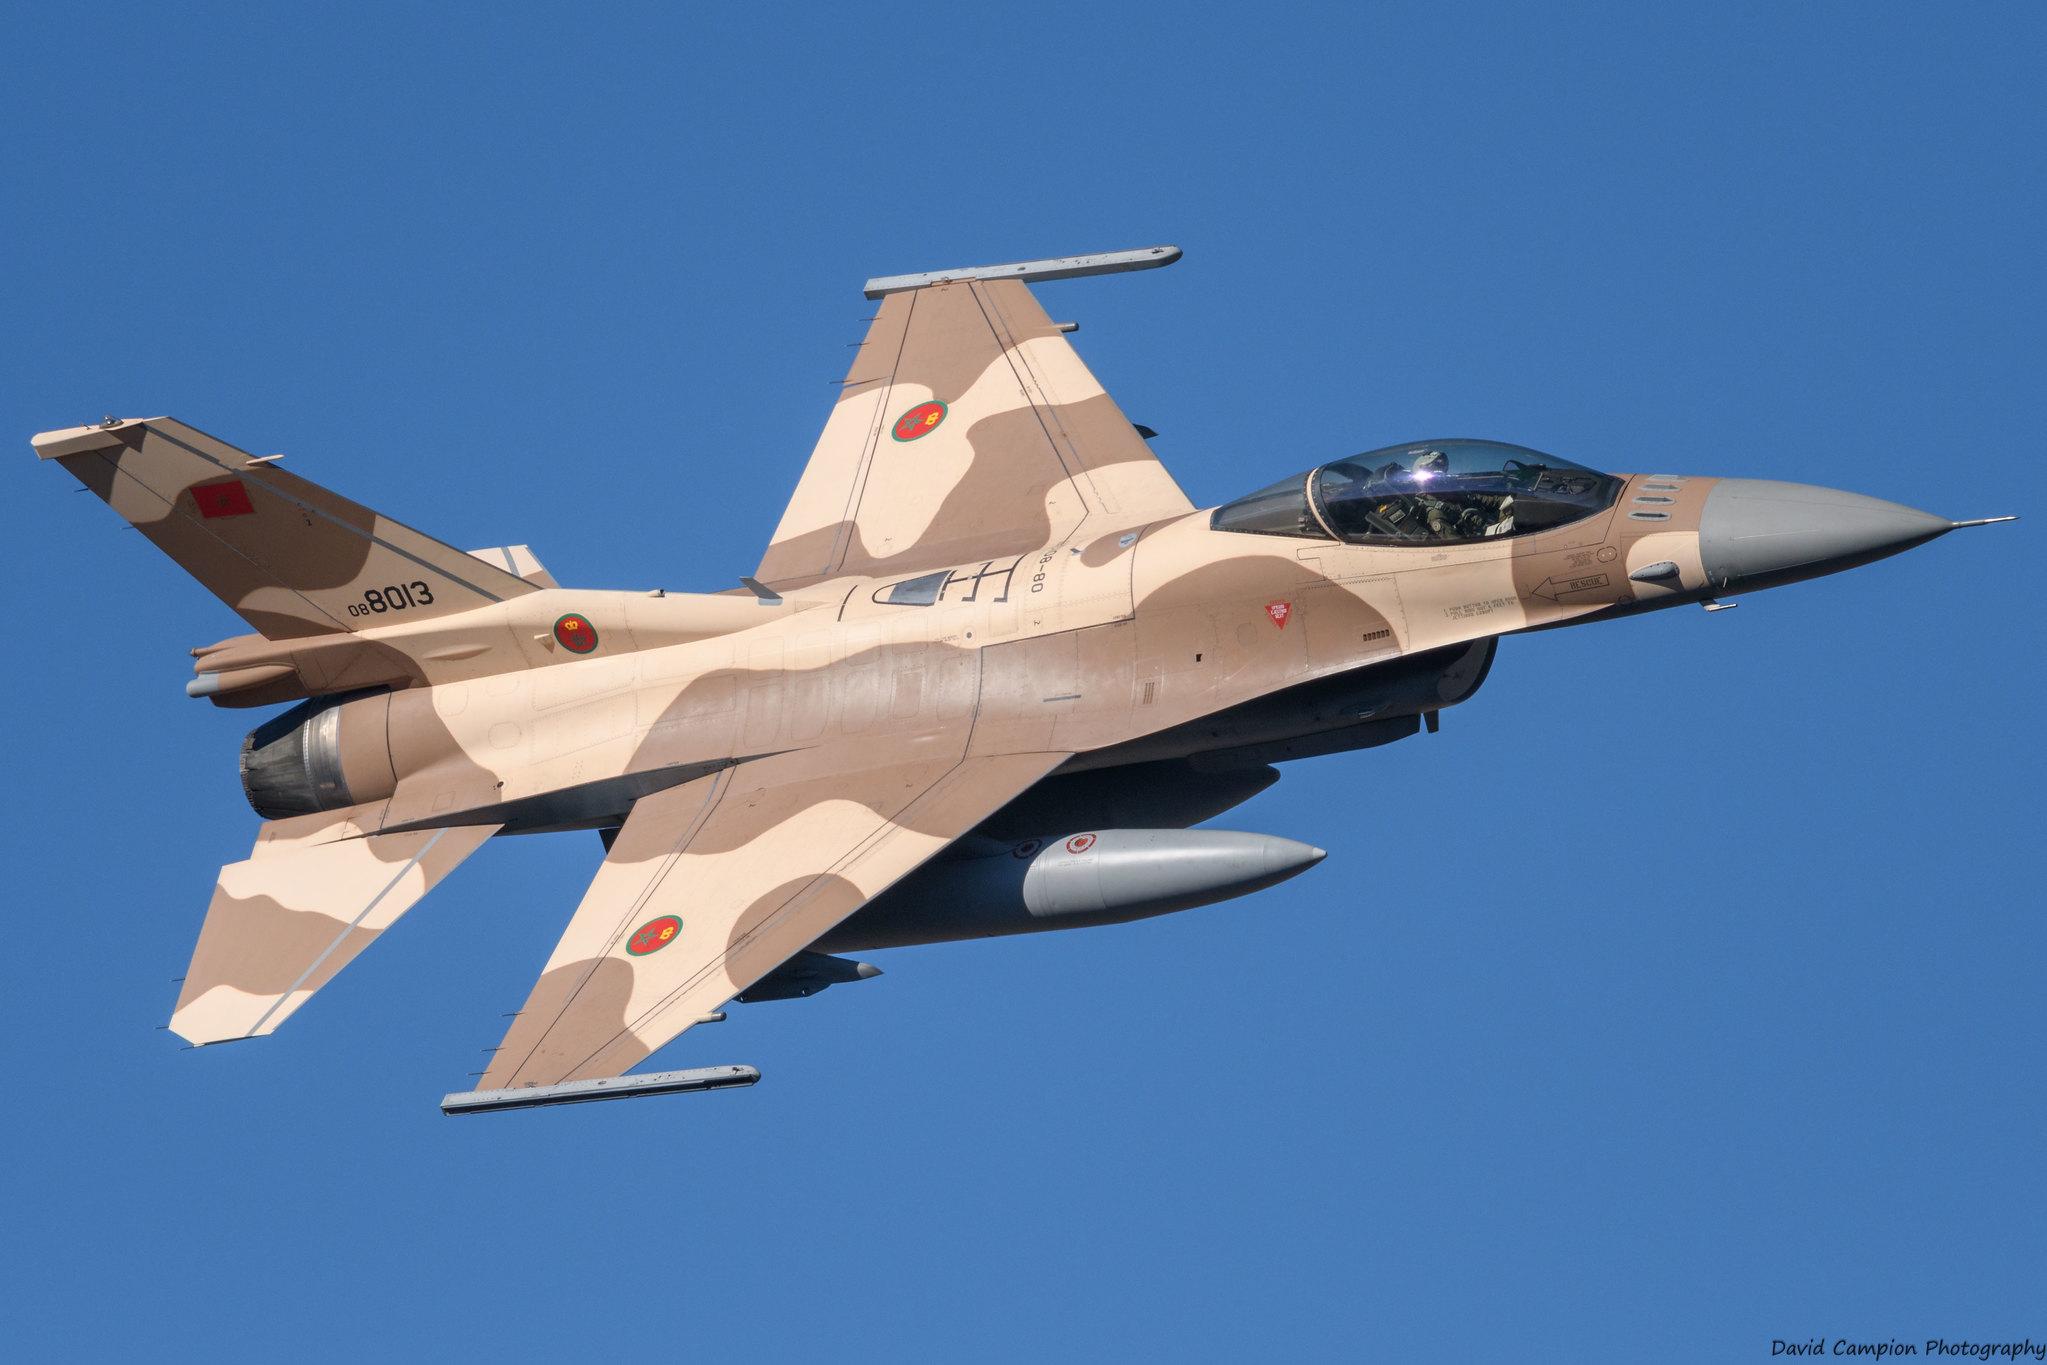 Photos RMAF F-16 C/D Block 52+ - Page 12 39843402413_83ee8a7da6_k